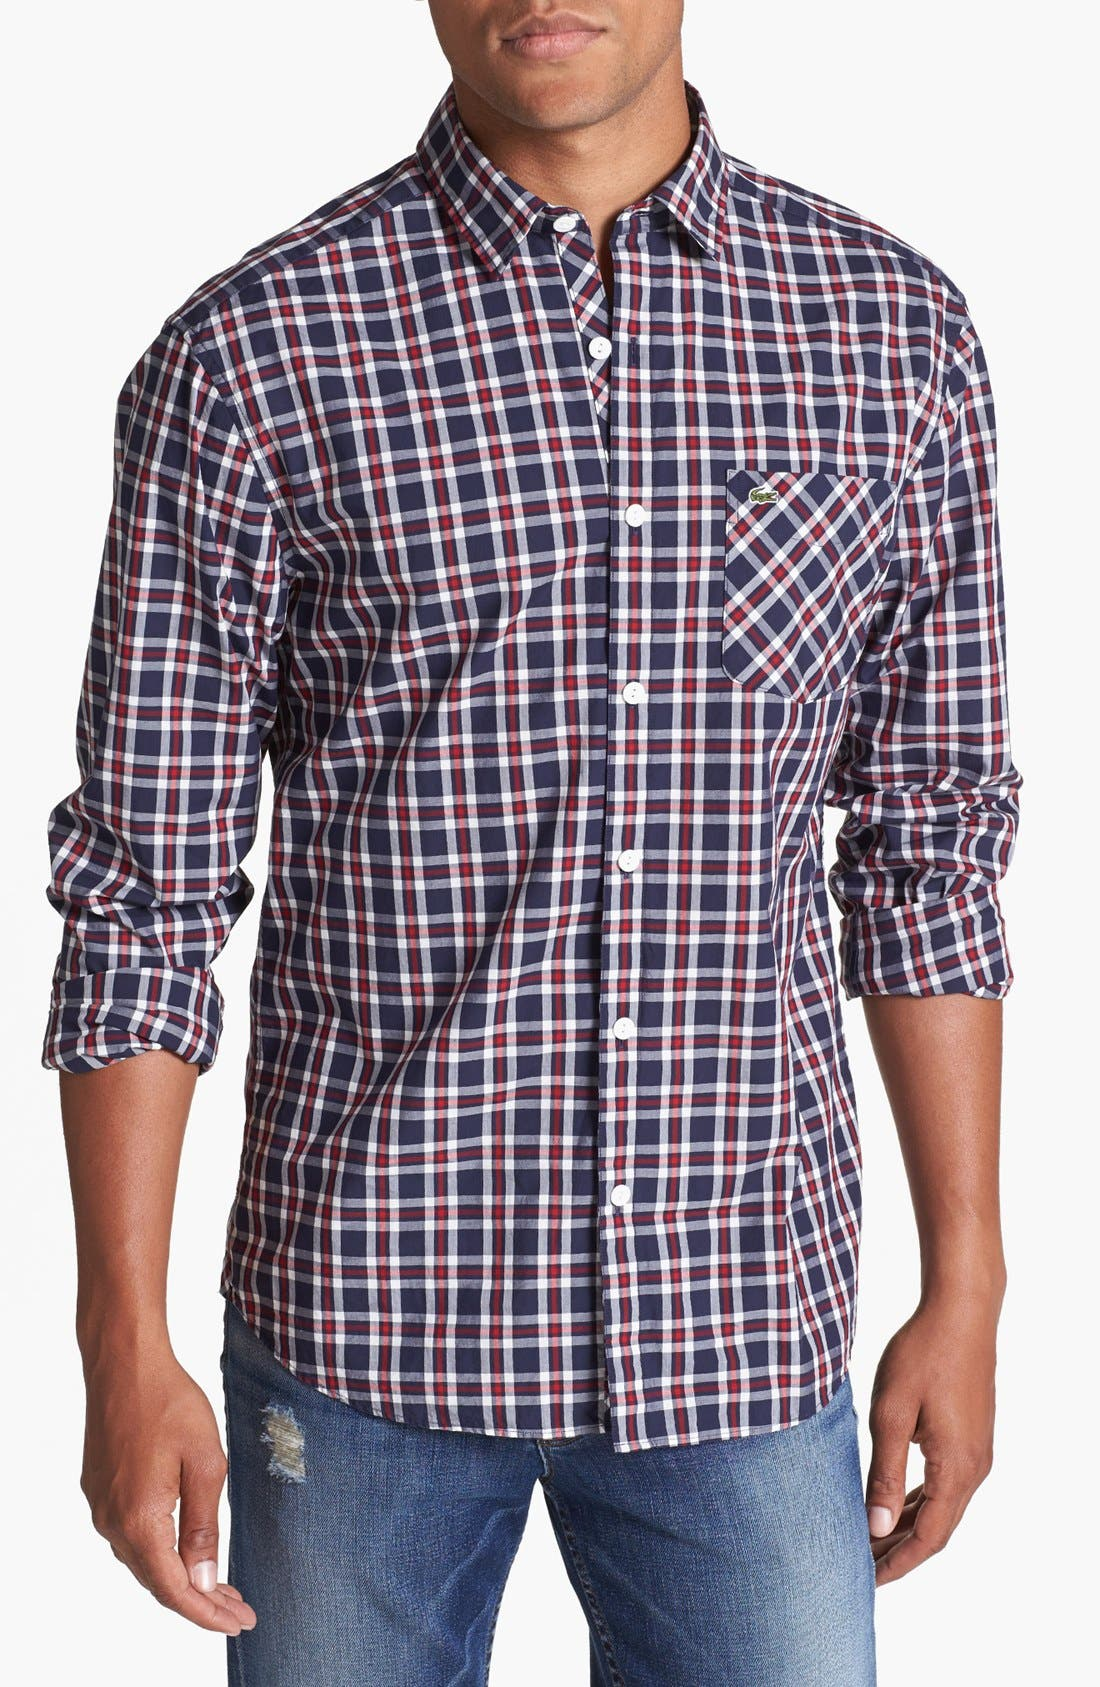 Alternate Image 1 Selected - Lacoste Slim Fit Plaid Shirt